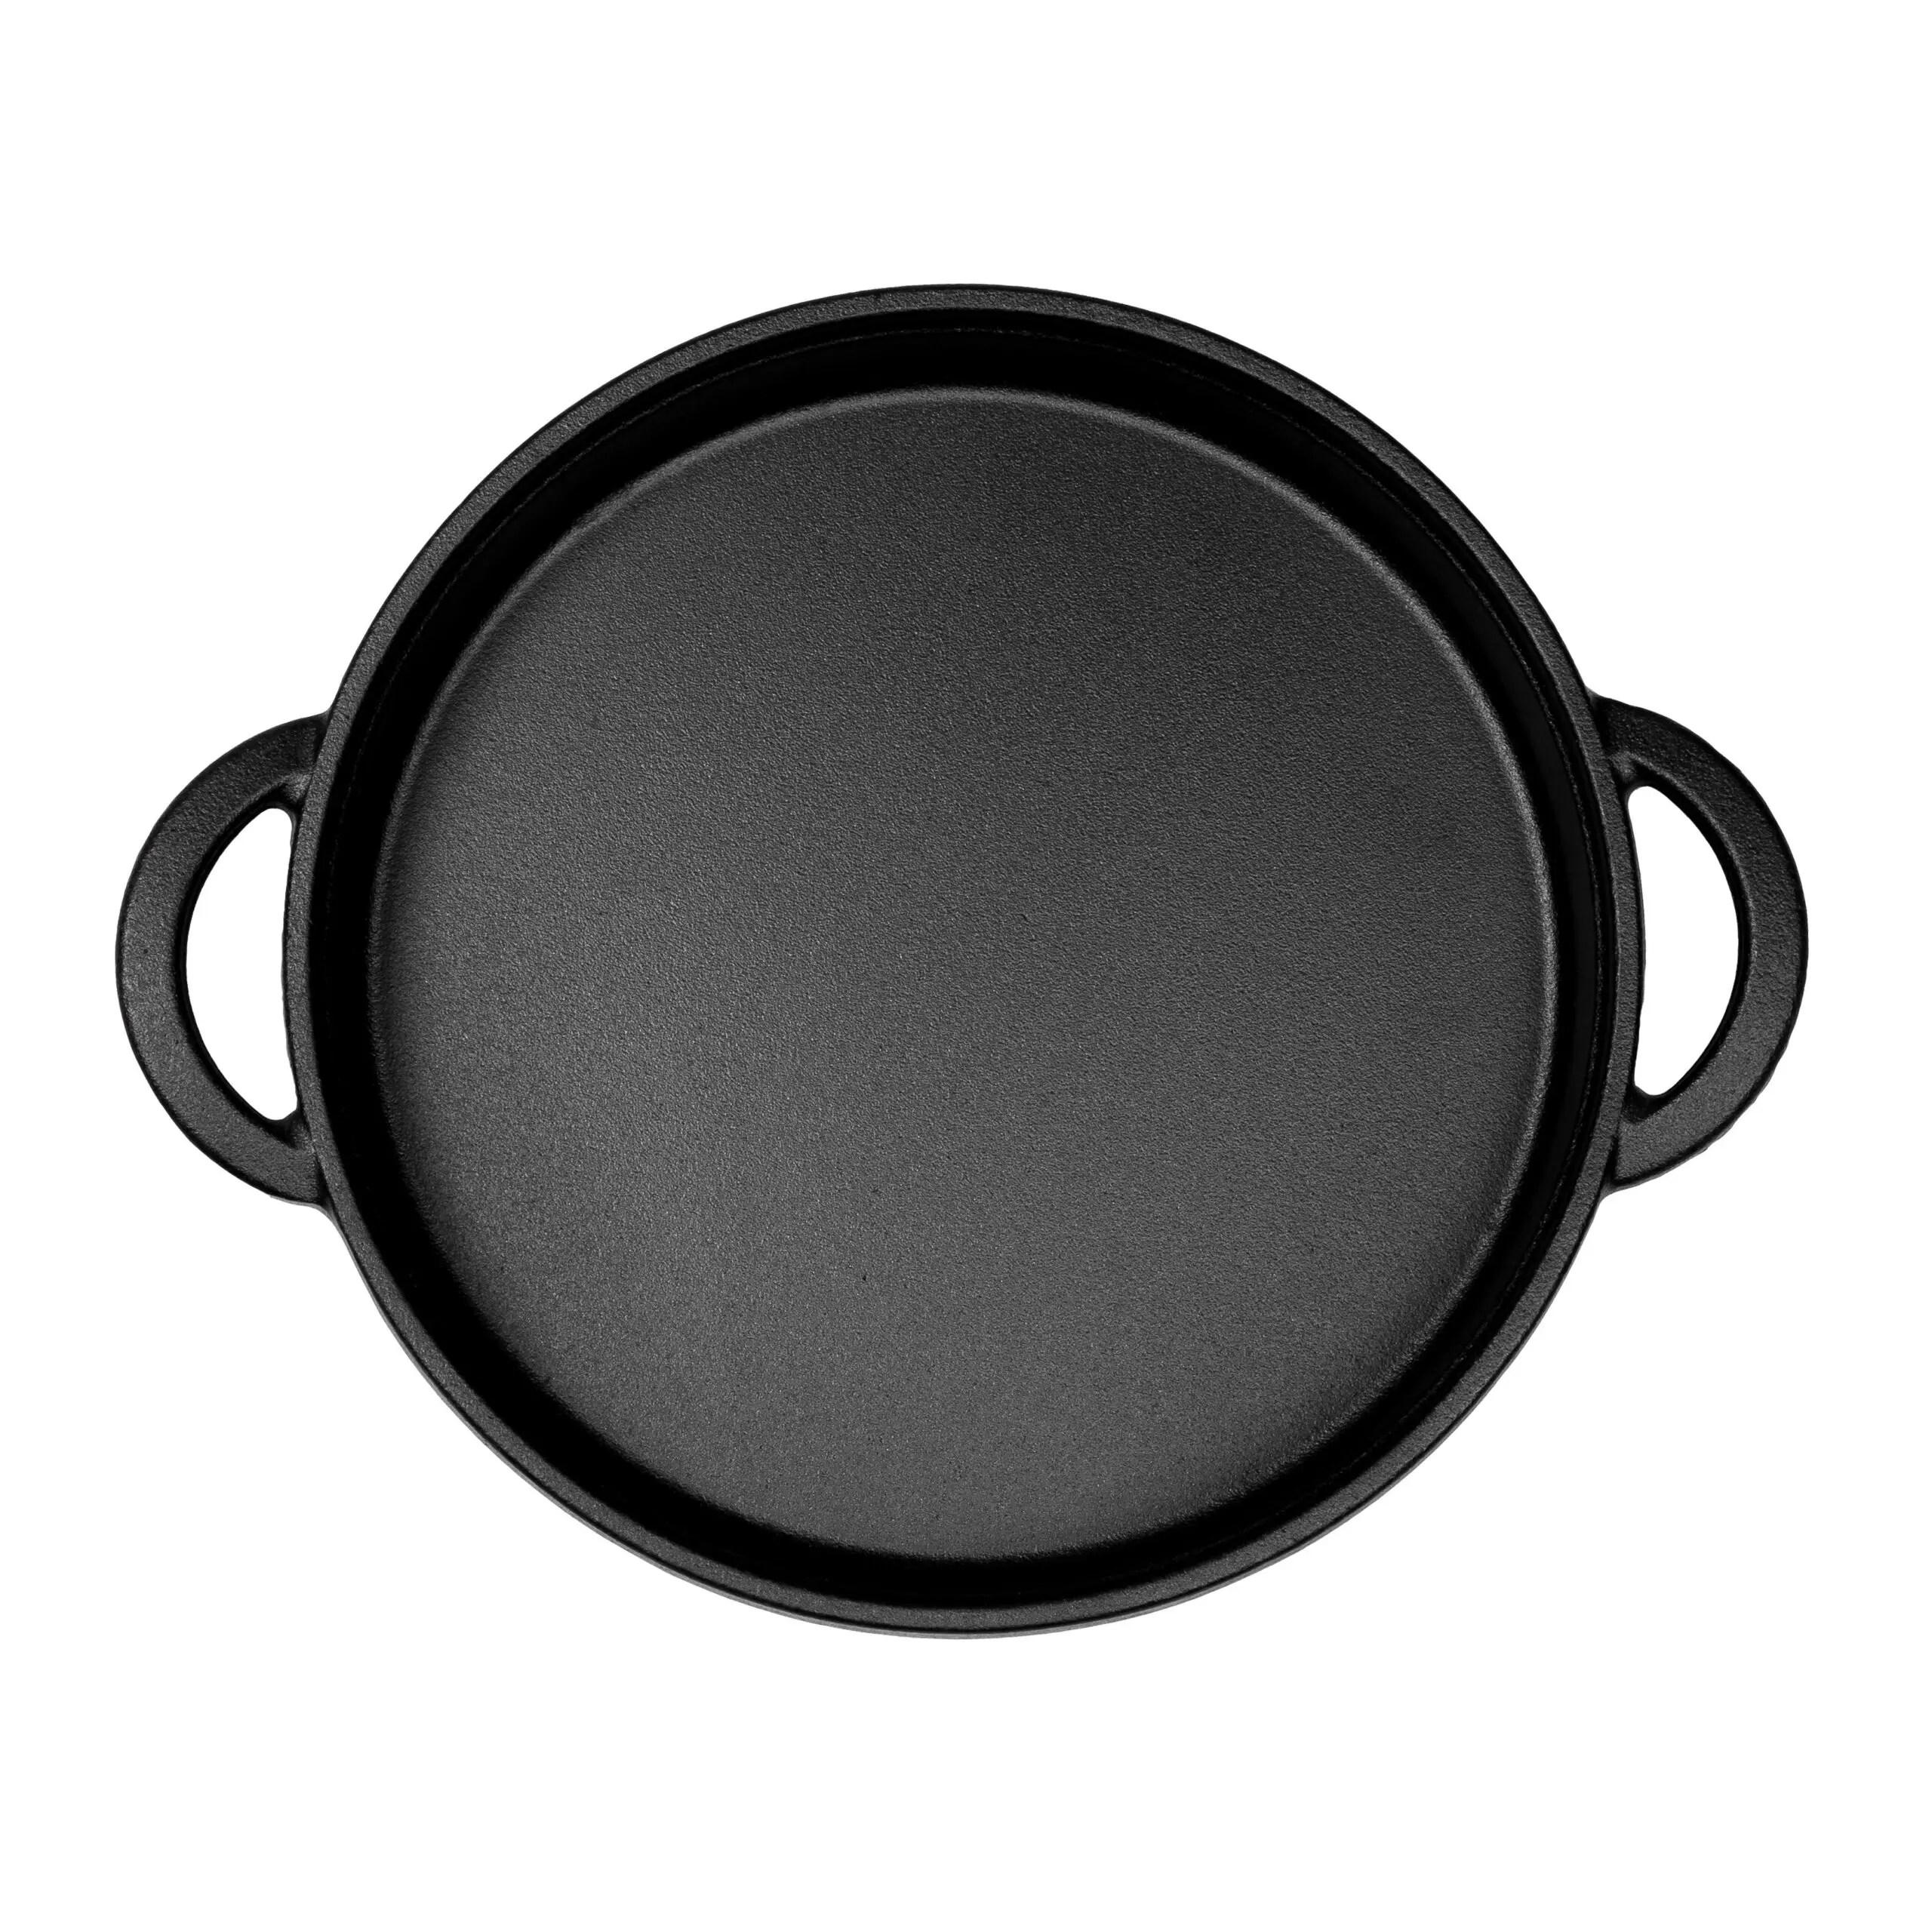 Dreamfire cast iron pan